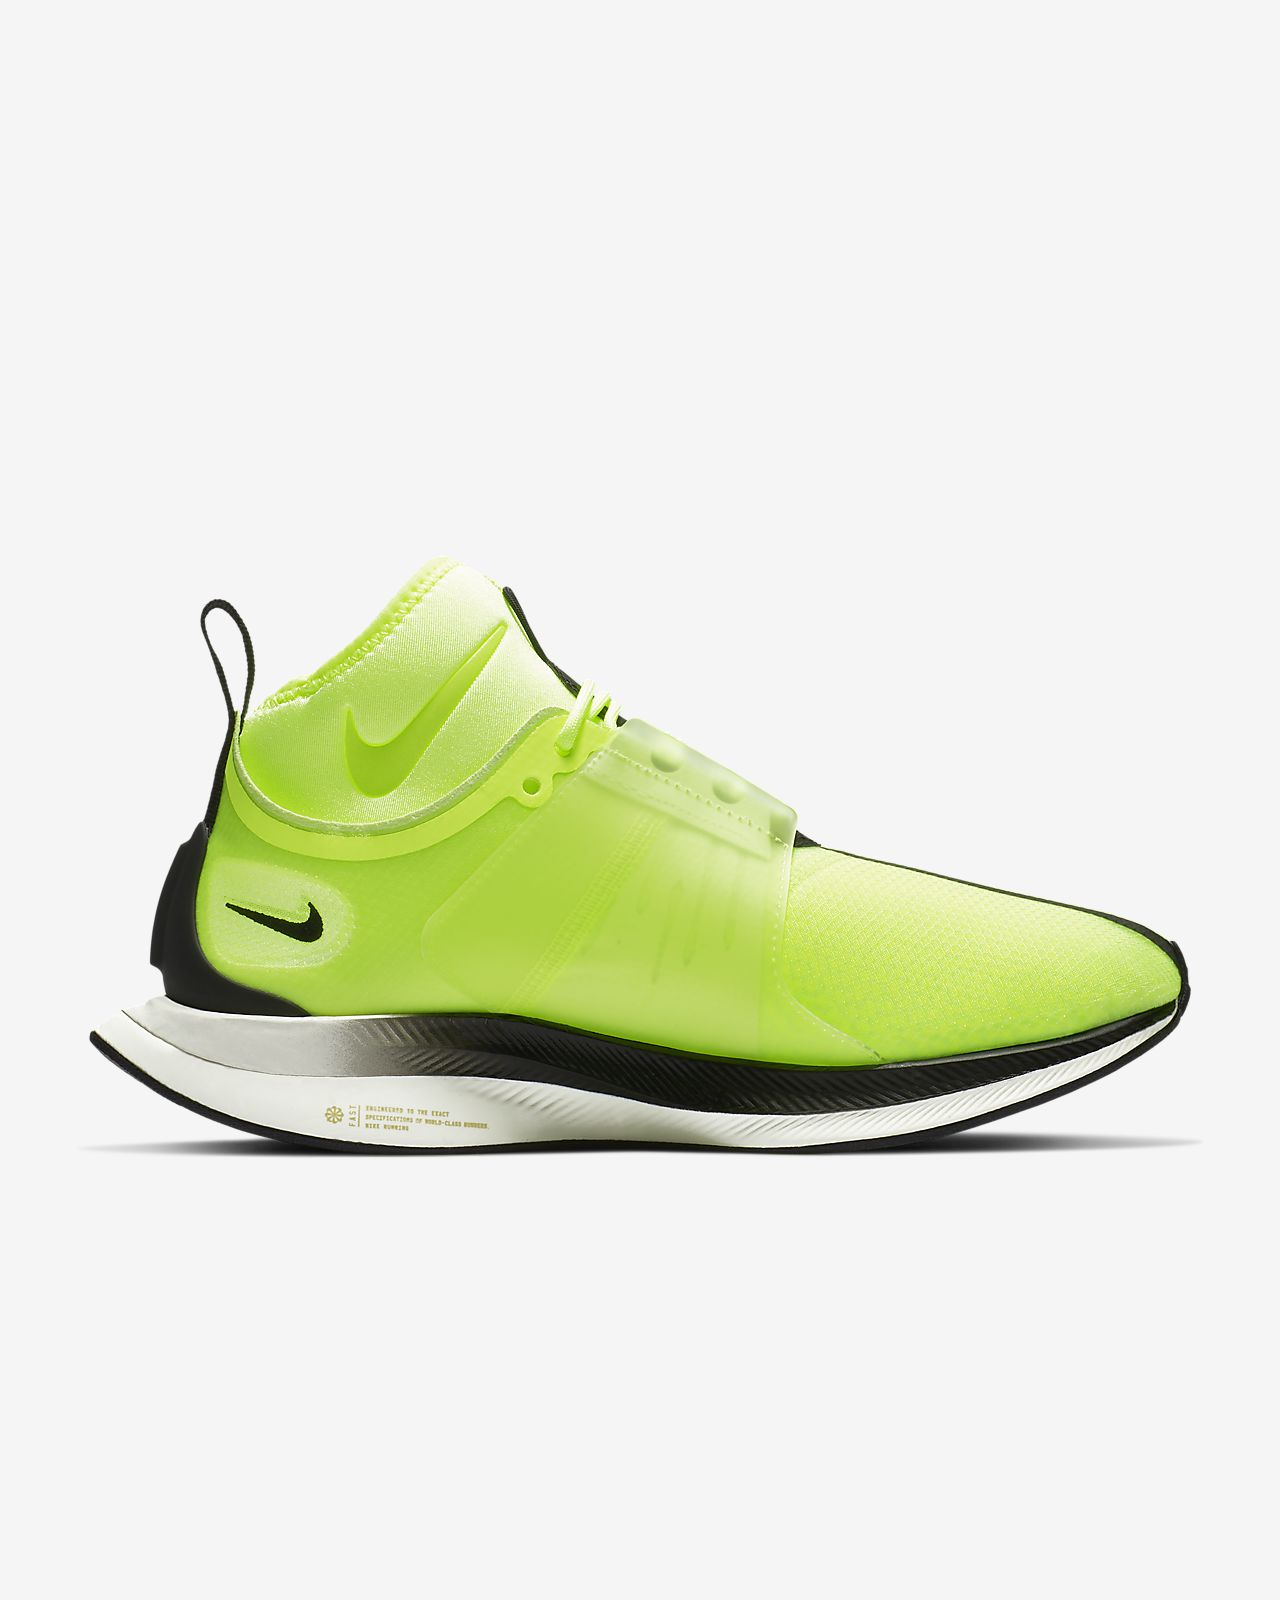 34c3ee4364b8 Nike Zoom Pegasus Turbo XX Women s Running Shoe. Nike.com GB